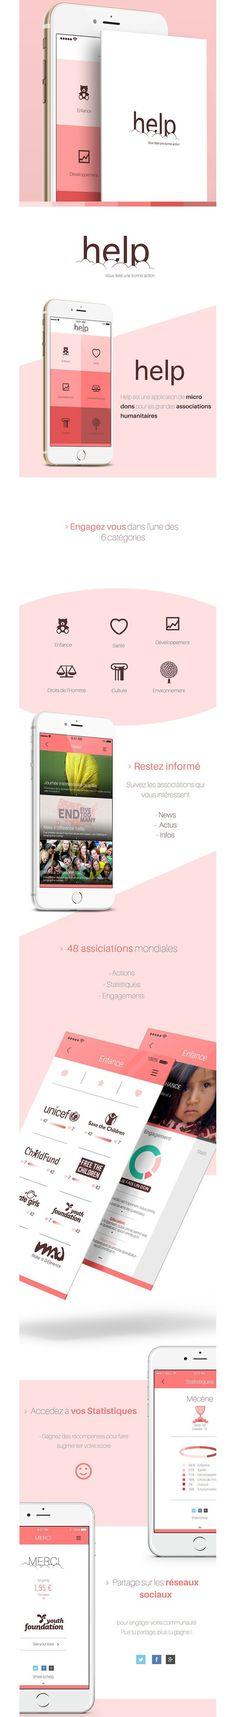 Mobile App / Flat De